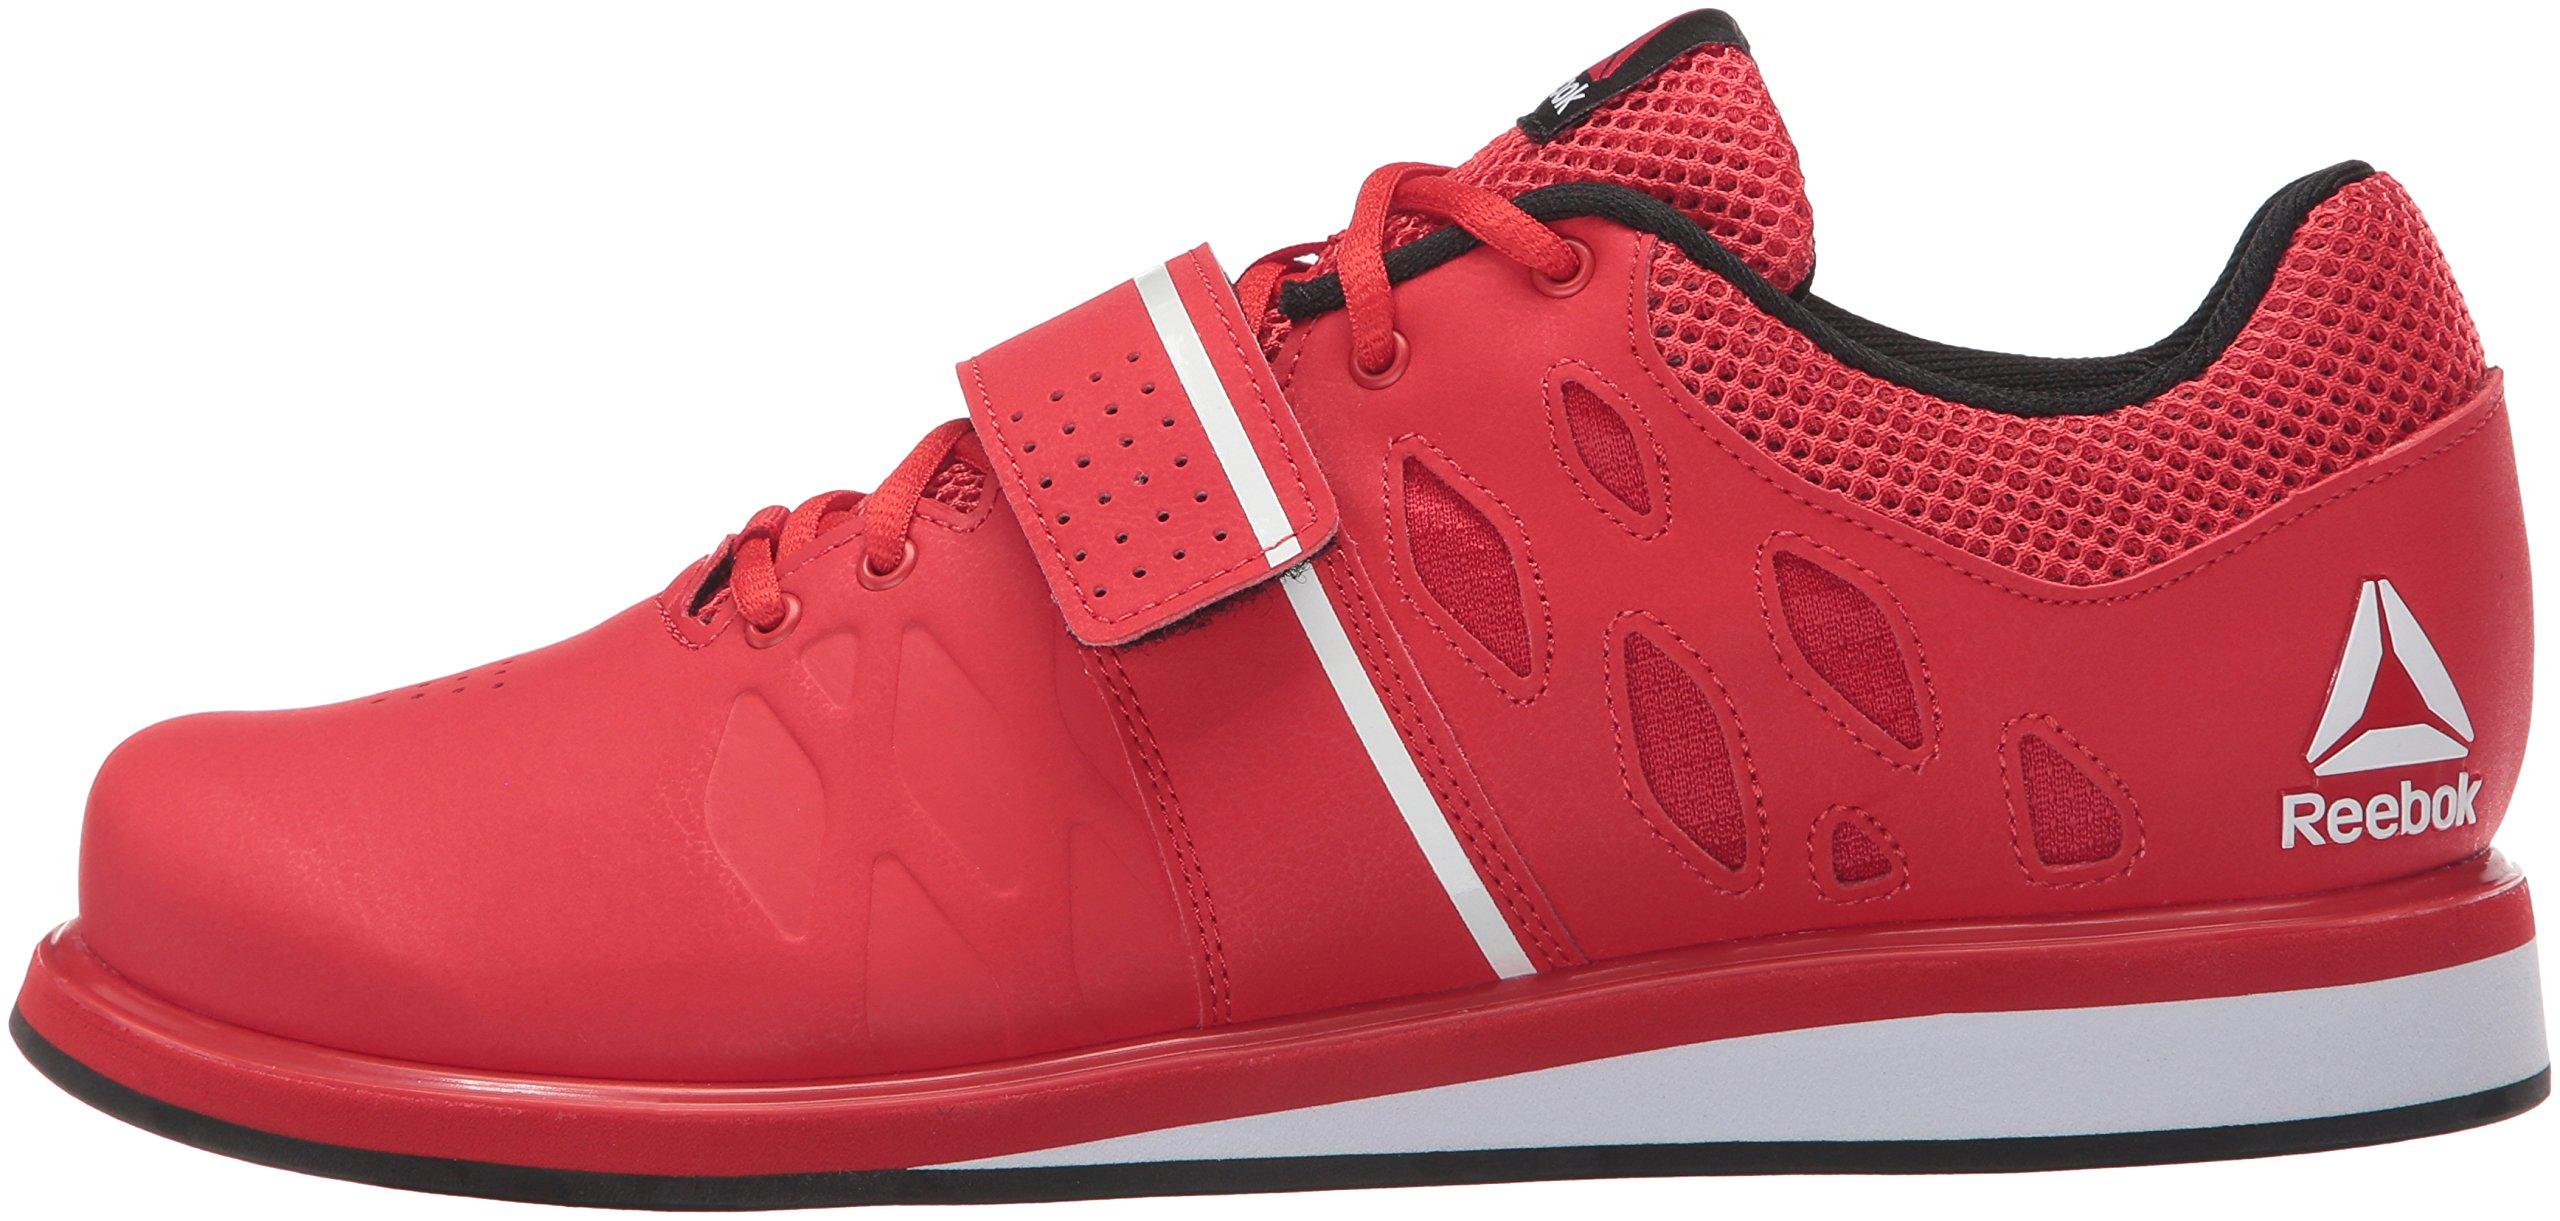 Reebok Men's Lifter Pr Cross-Trainer Shoe, Primal Red/Black/White, 7.5 M US by Reebok (Image #5)